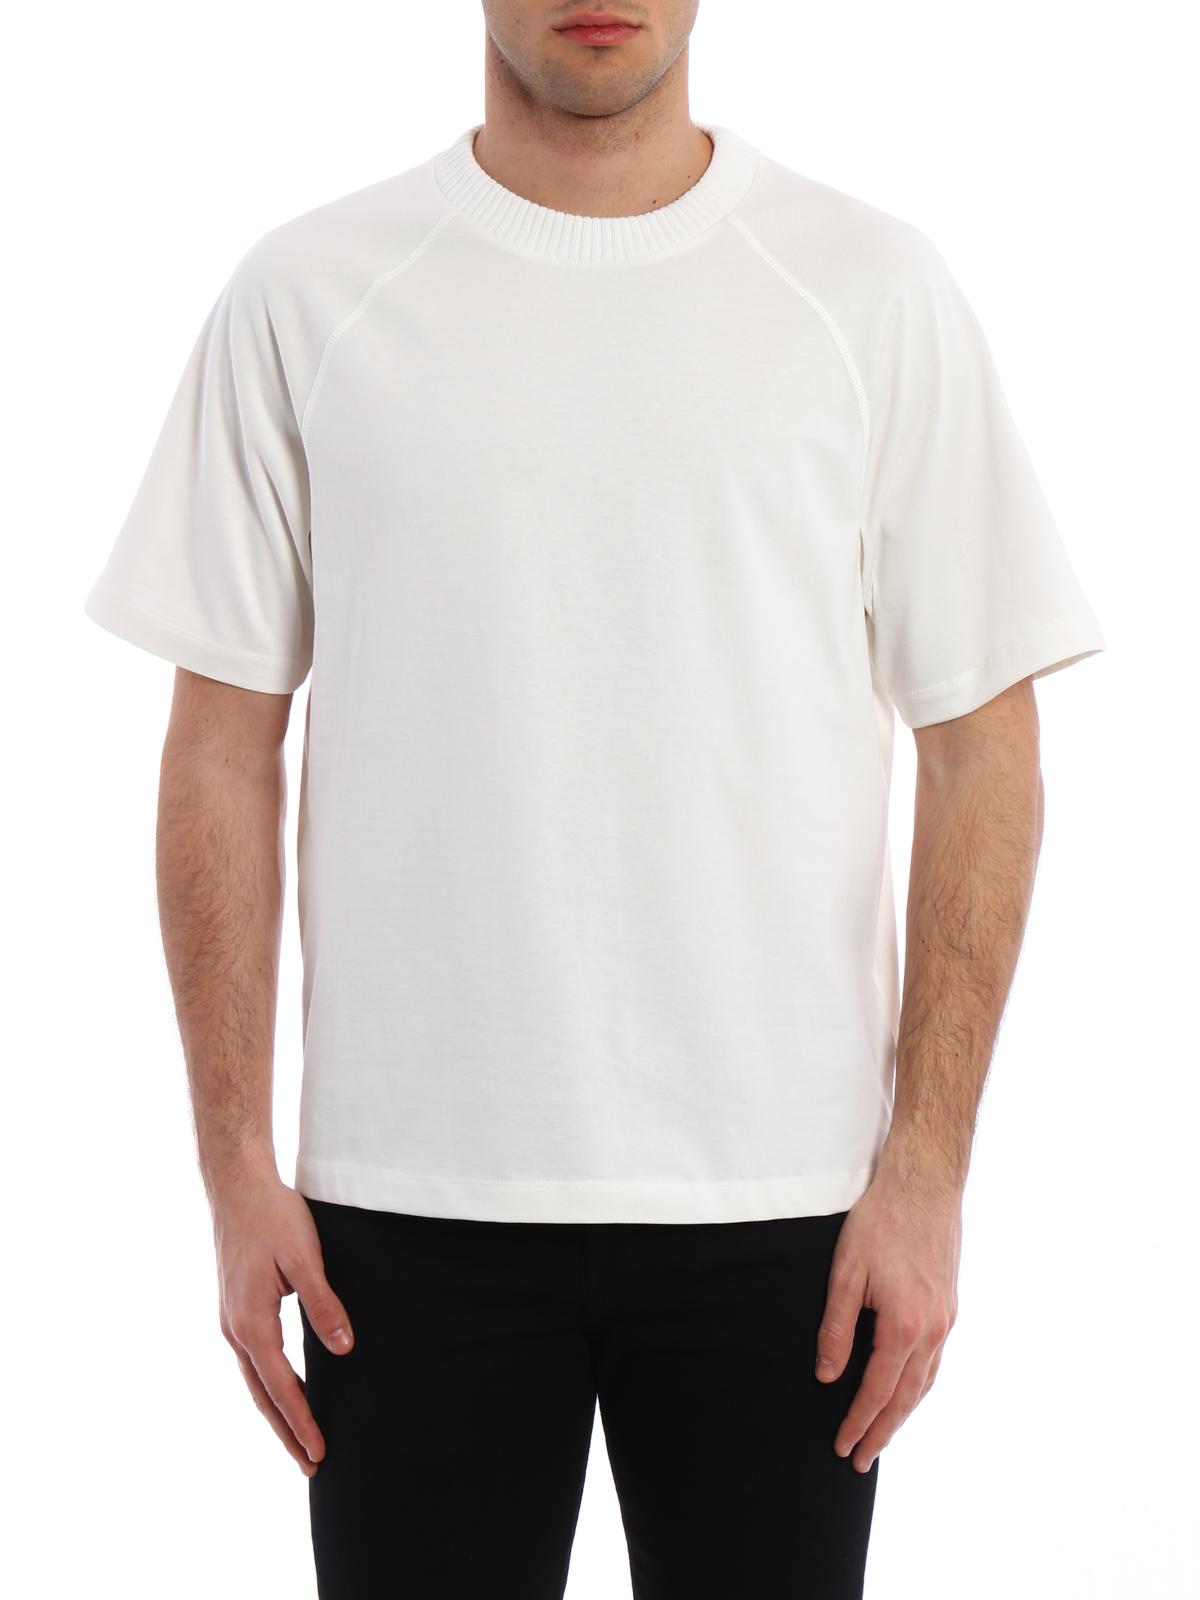 T shirt off white a manica corta moncler t shirt ikrix for Off white moncler t shirt